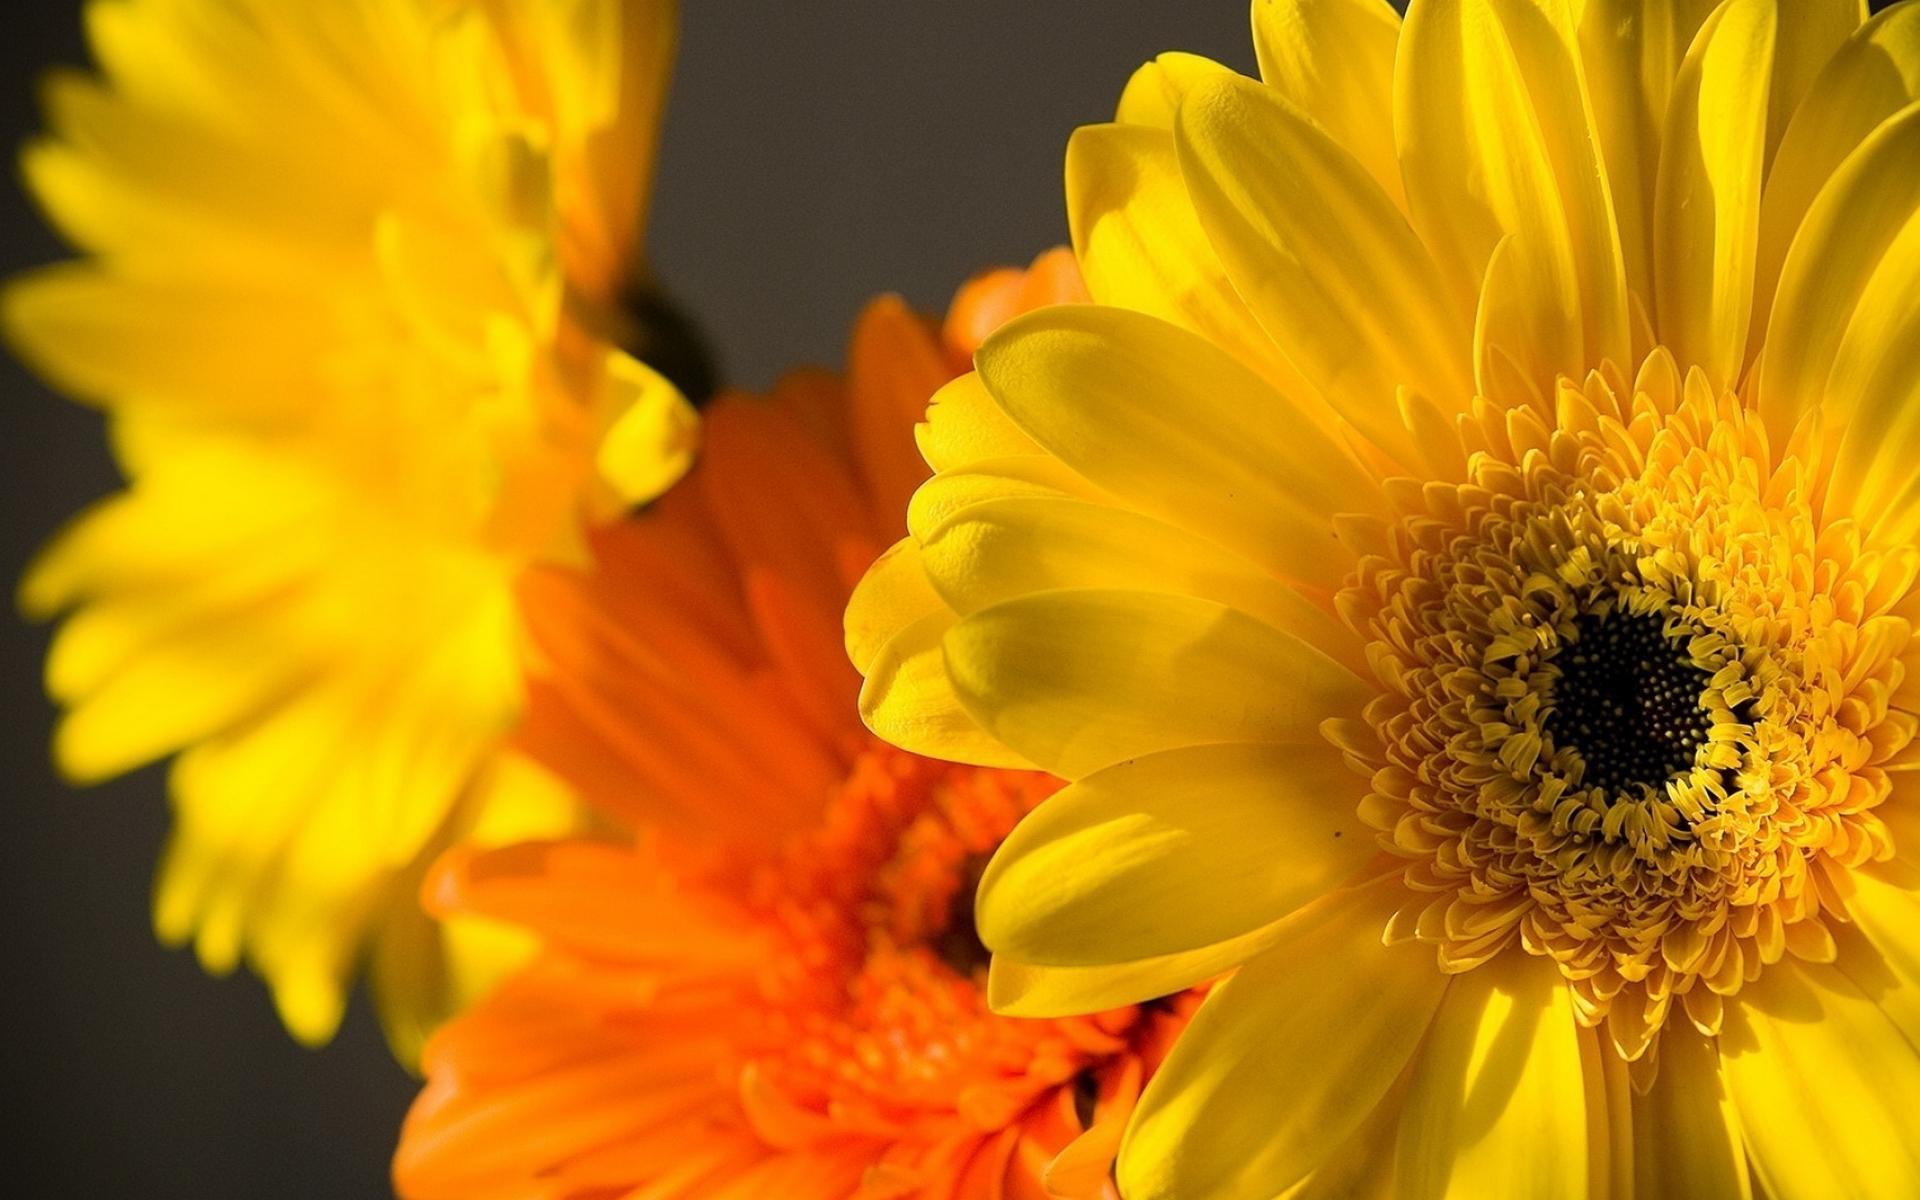 Желтые картинки красивые, маме дочке